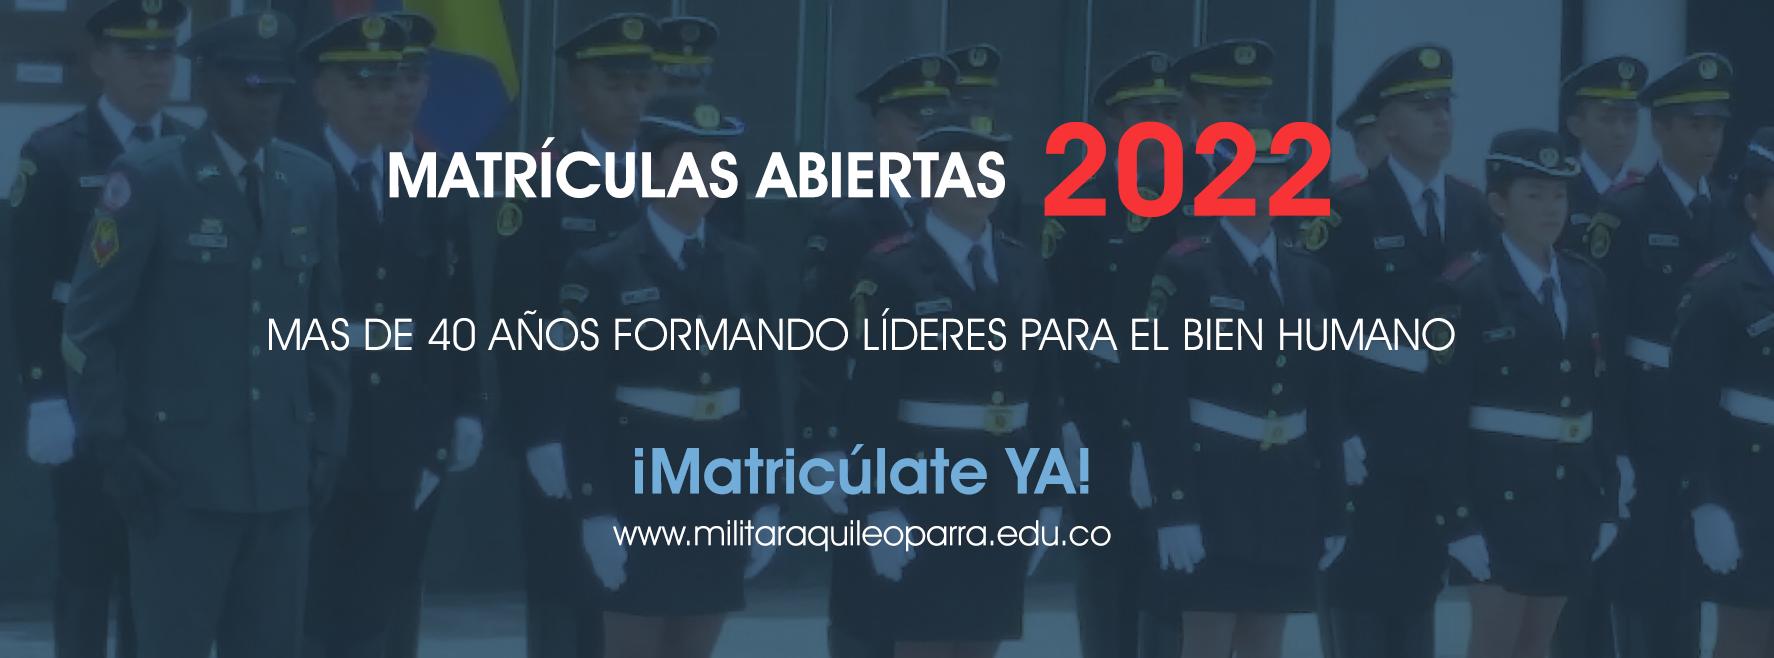 portada_matrículas2022